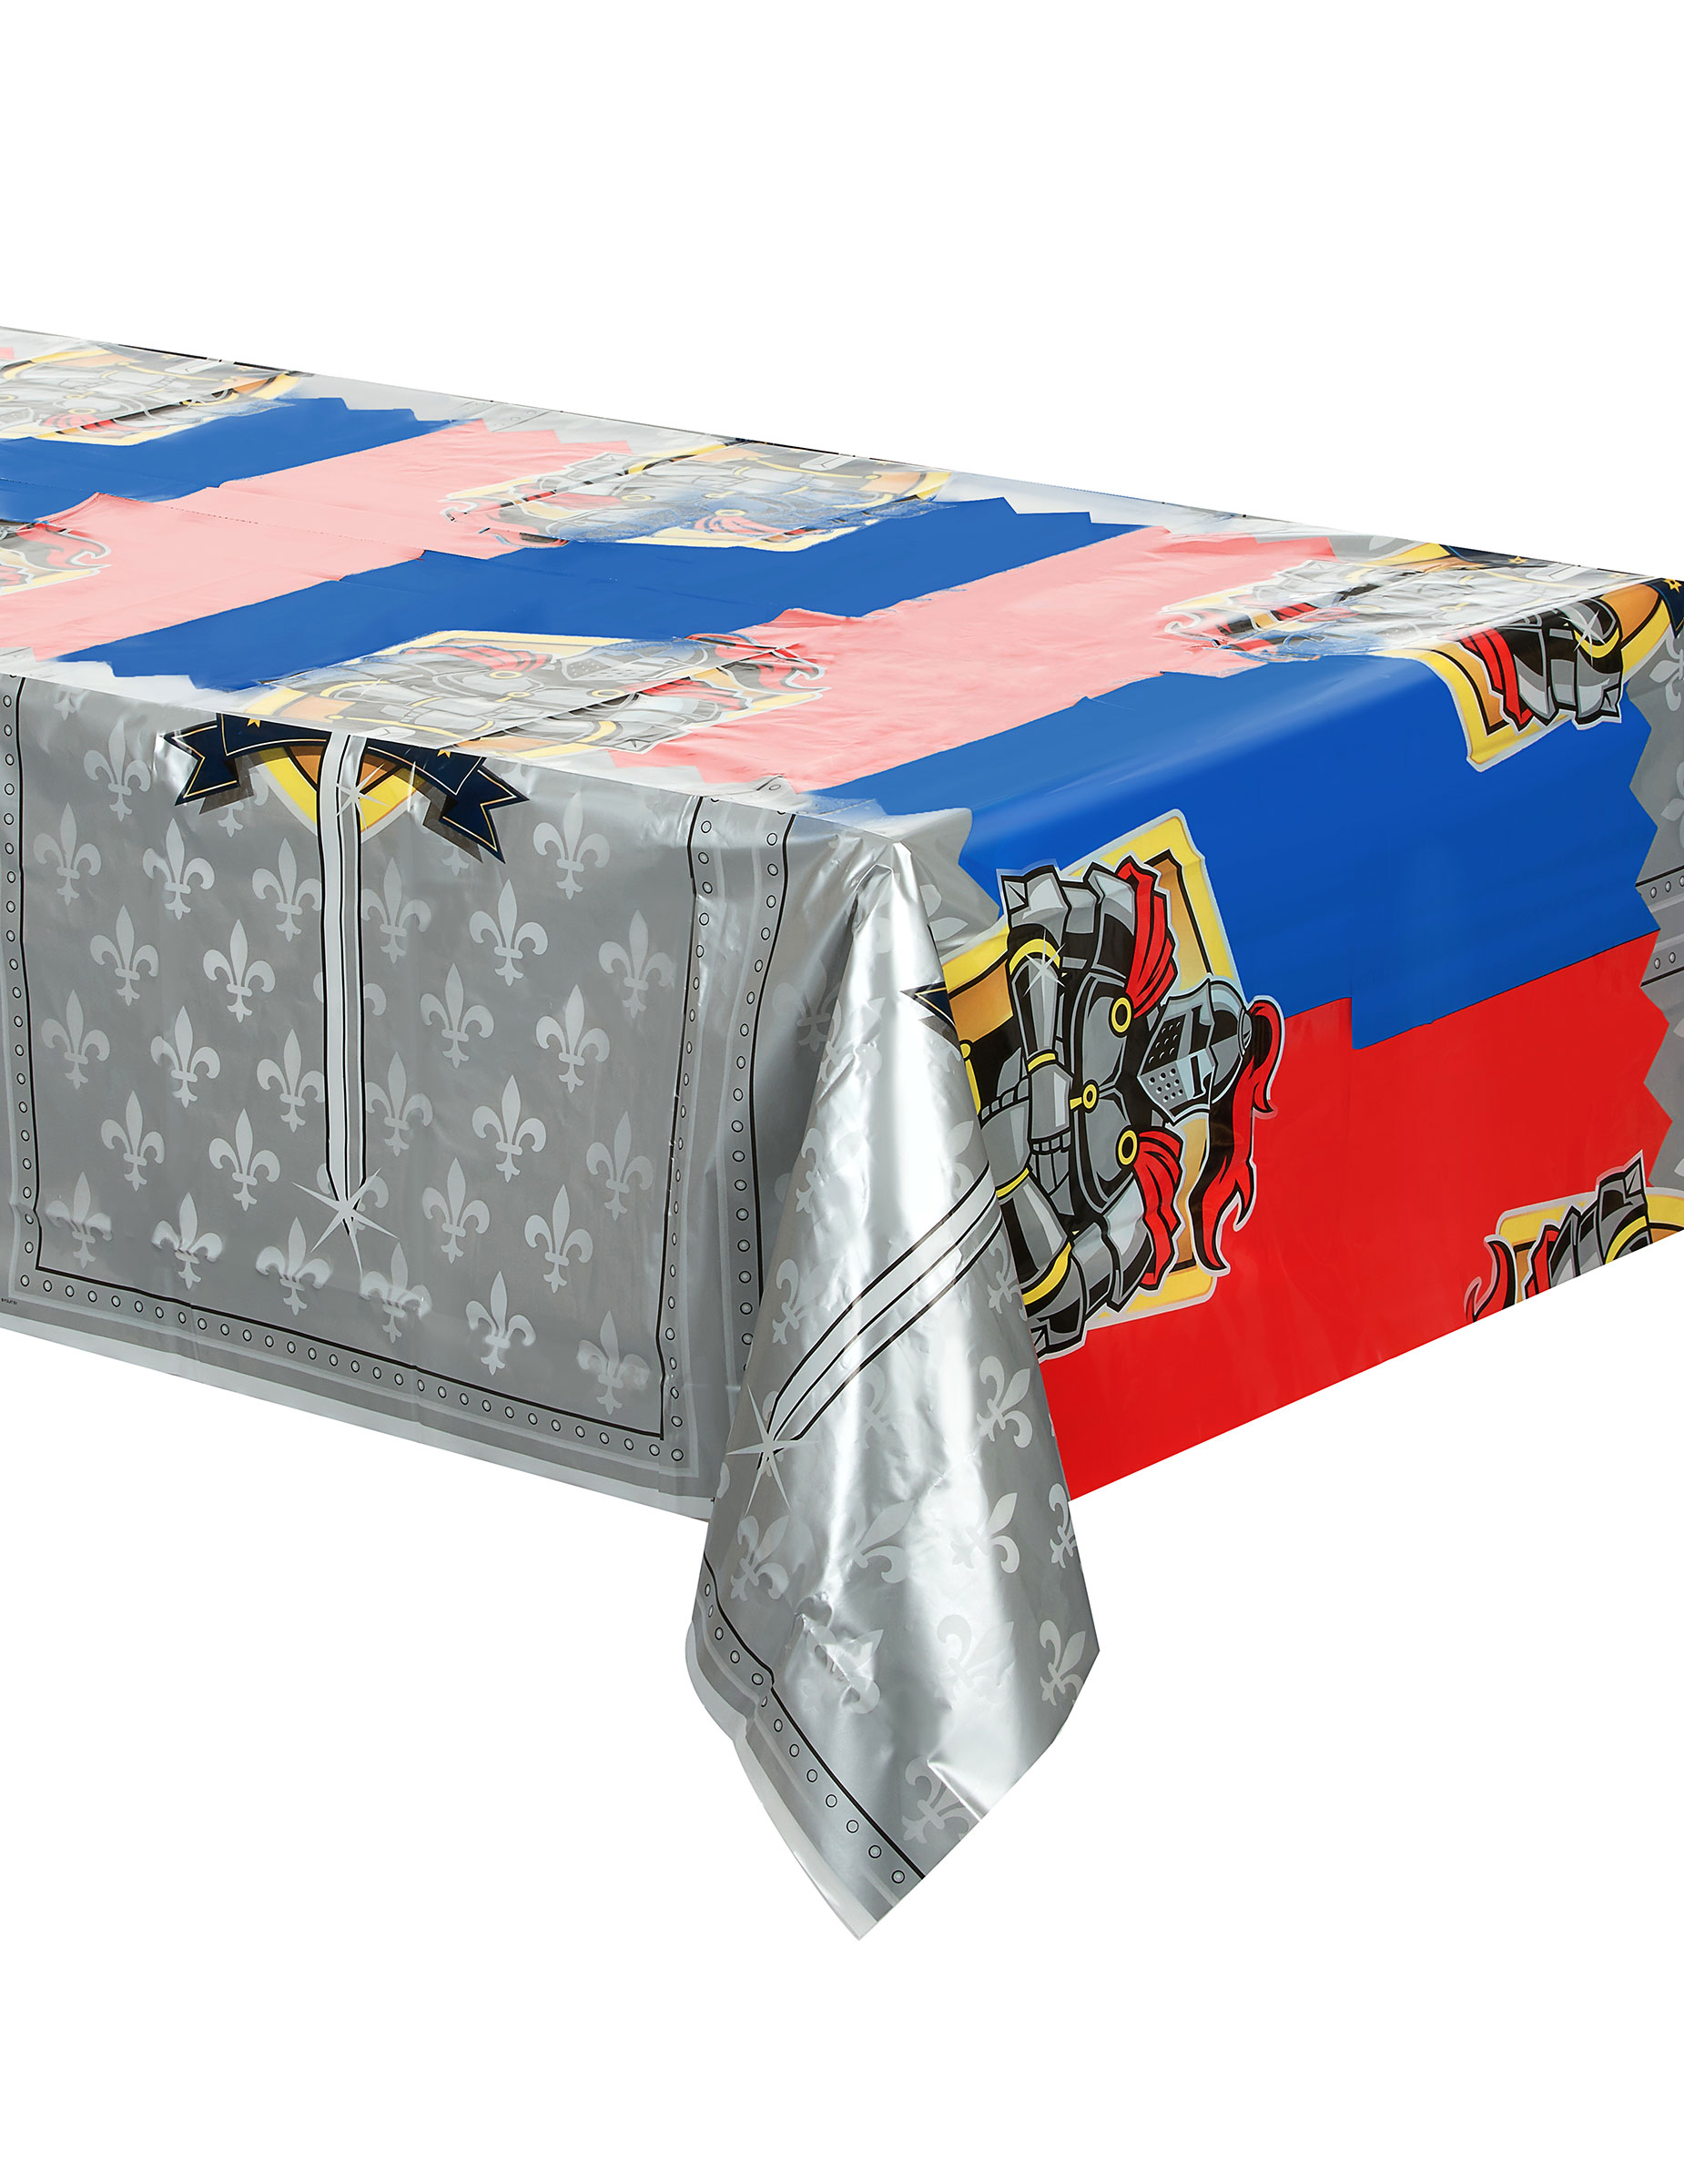 ritter kunststoff tischdecke 130 x 180 cm g nstige faschings partydeko zubeh r bei karneval. Black Bedroom Furniture Sets. Home Design Ideas